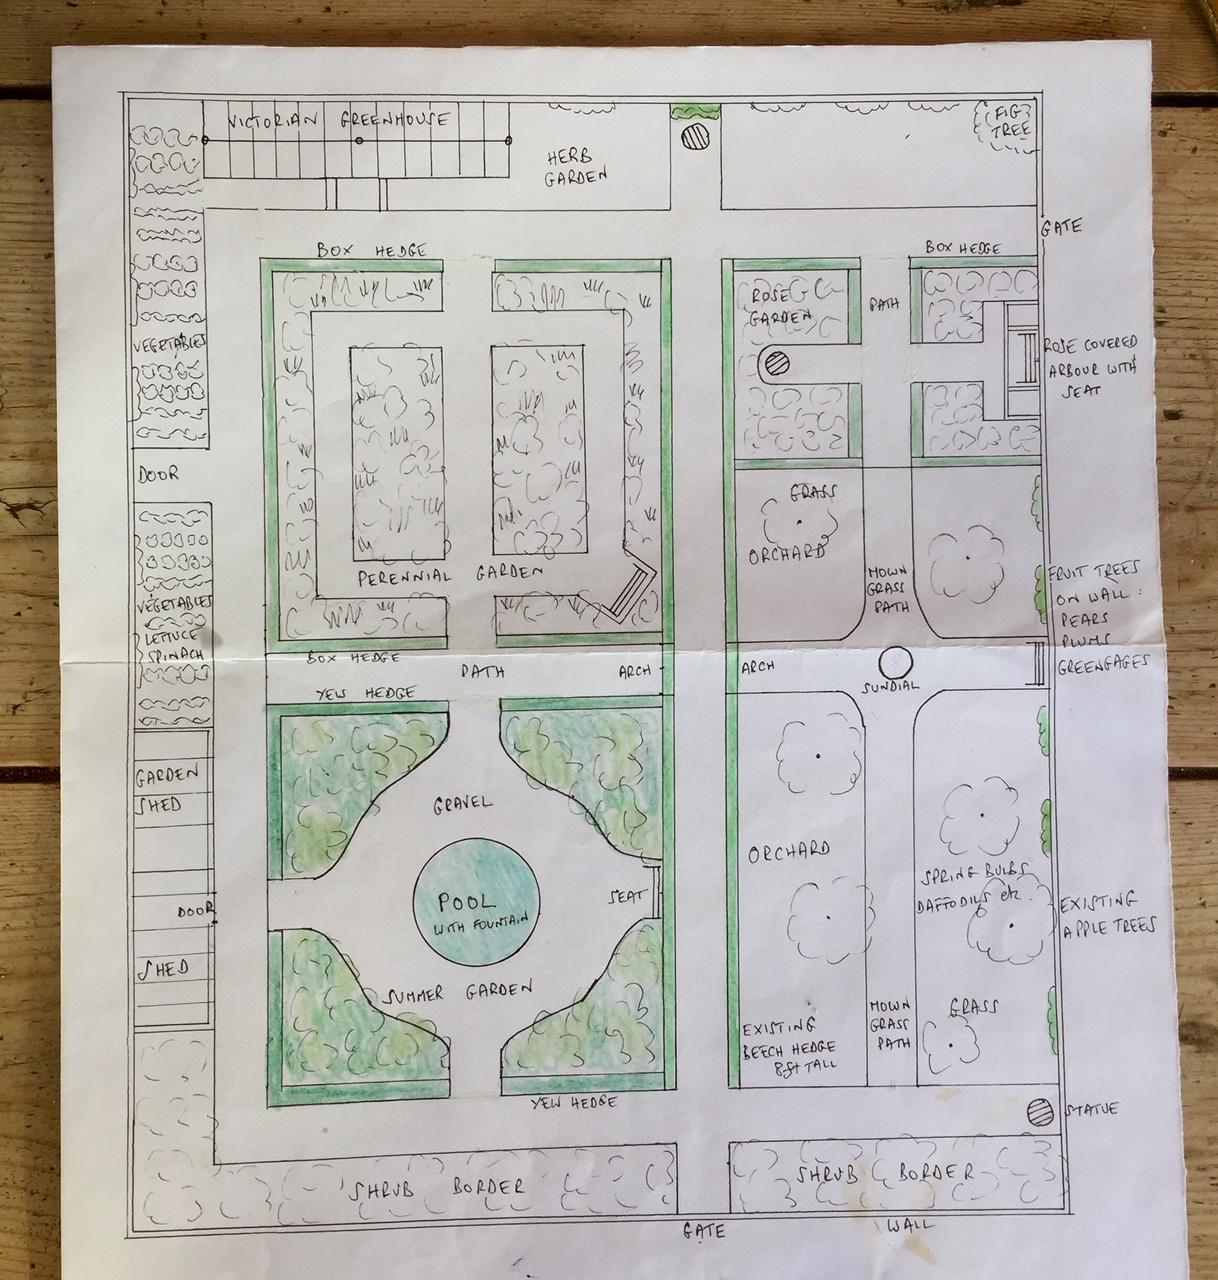 Garden plan for Glanesfort - sq.jpg